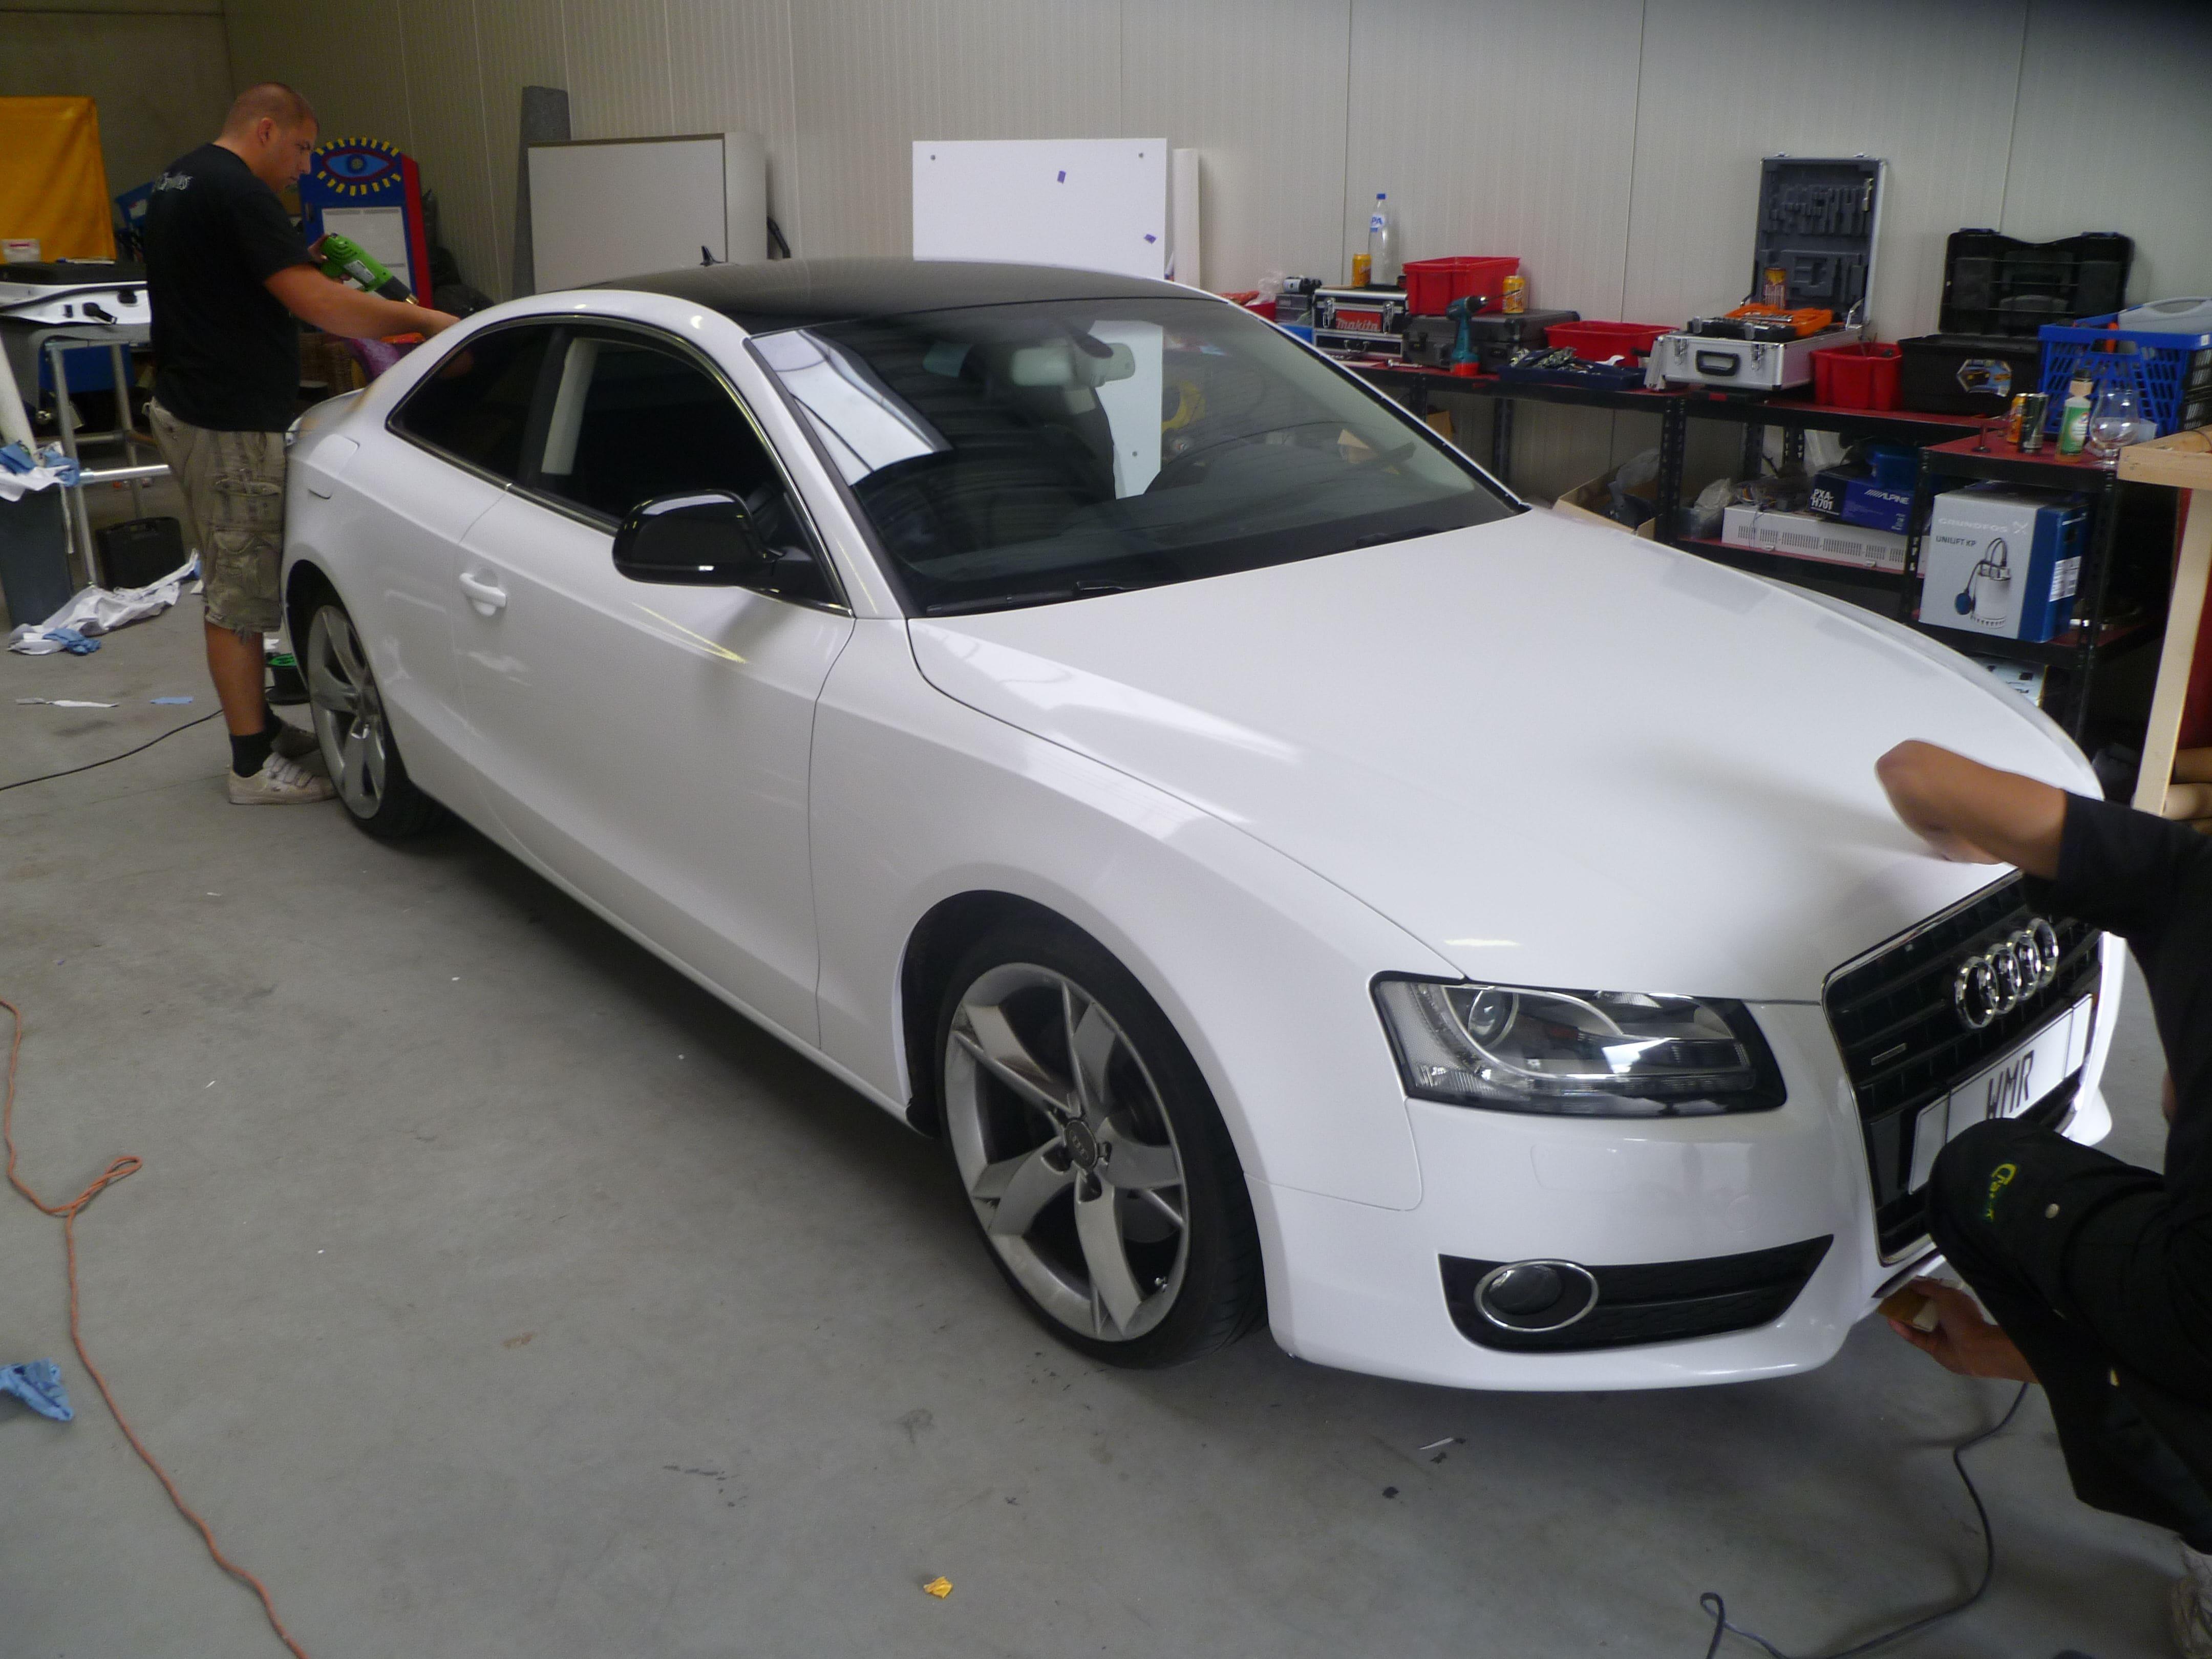 Audi A5 coupe met Metallic Witte Wrap, Carwrapping door Wrapmyride.nu Foto-nr:4733, ©2021